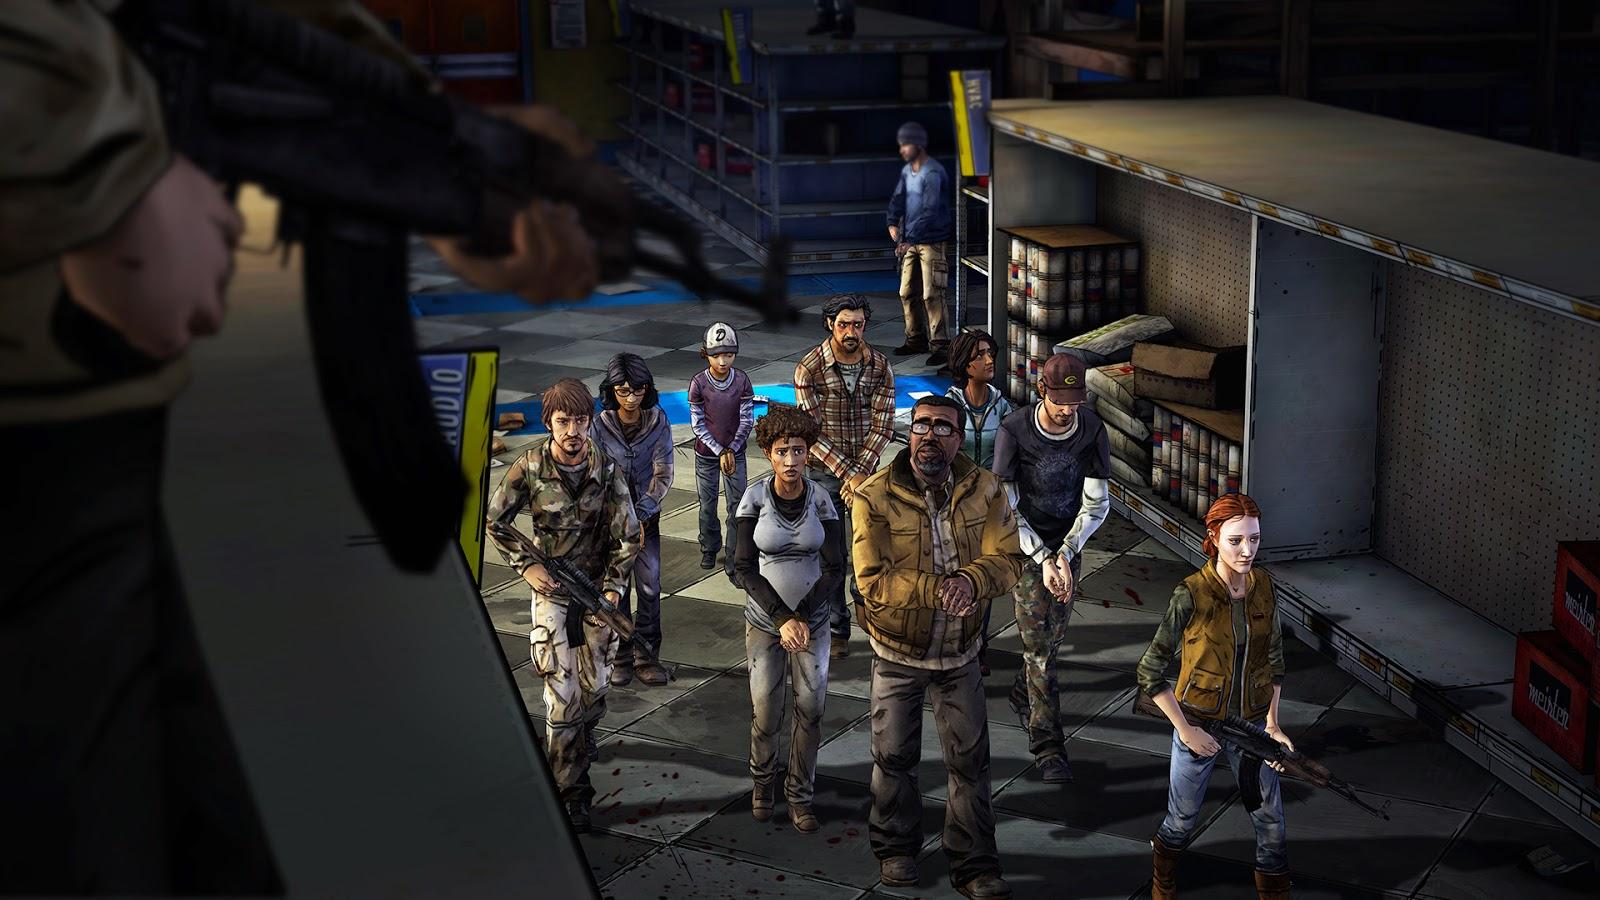 Review The Walking Dead Season 2 Episode 3 In Harms